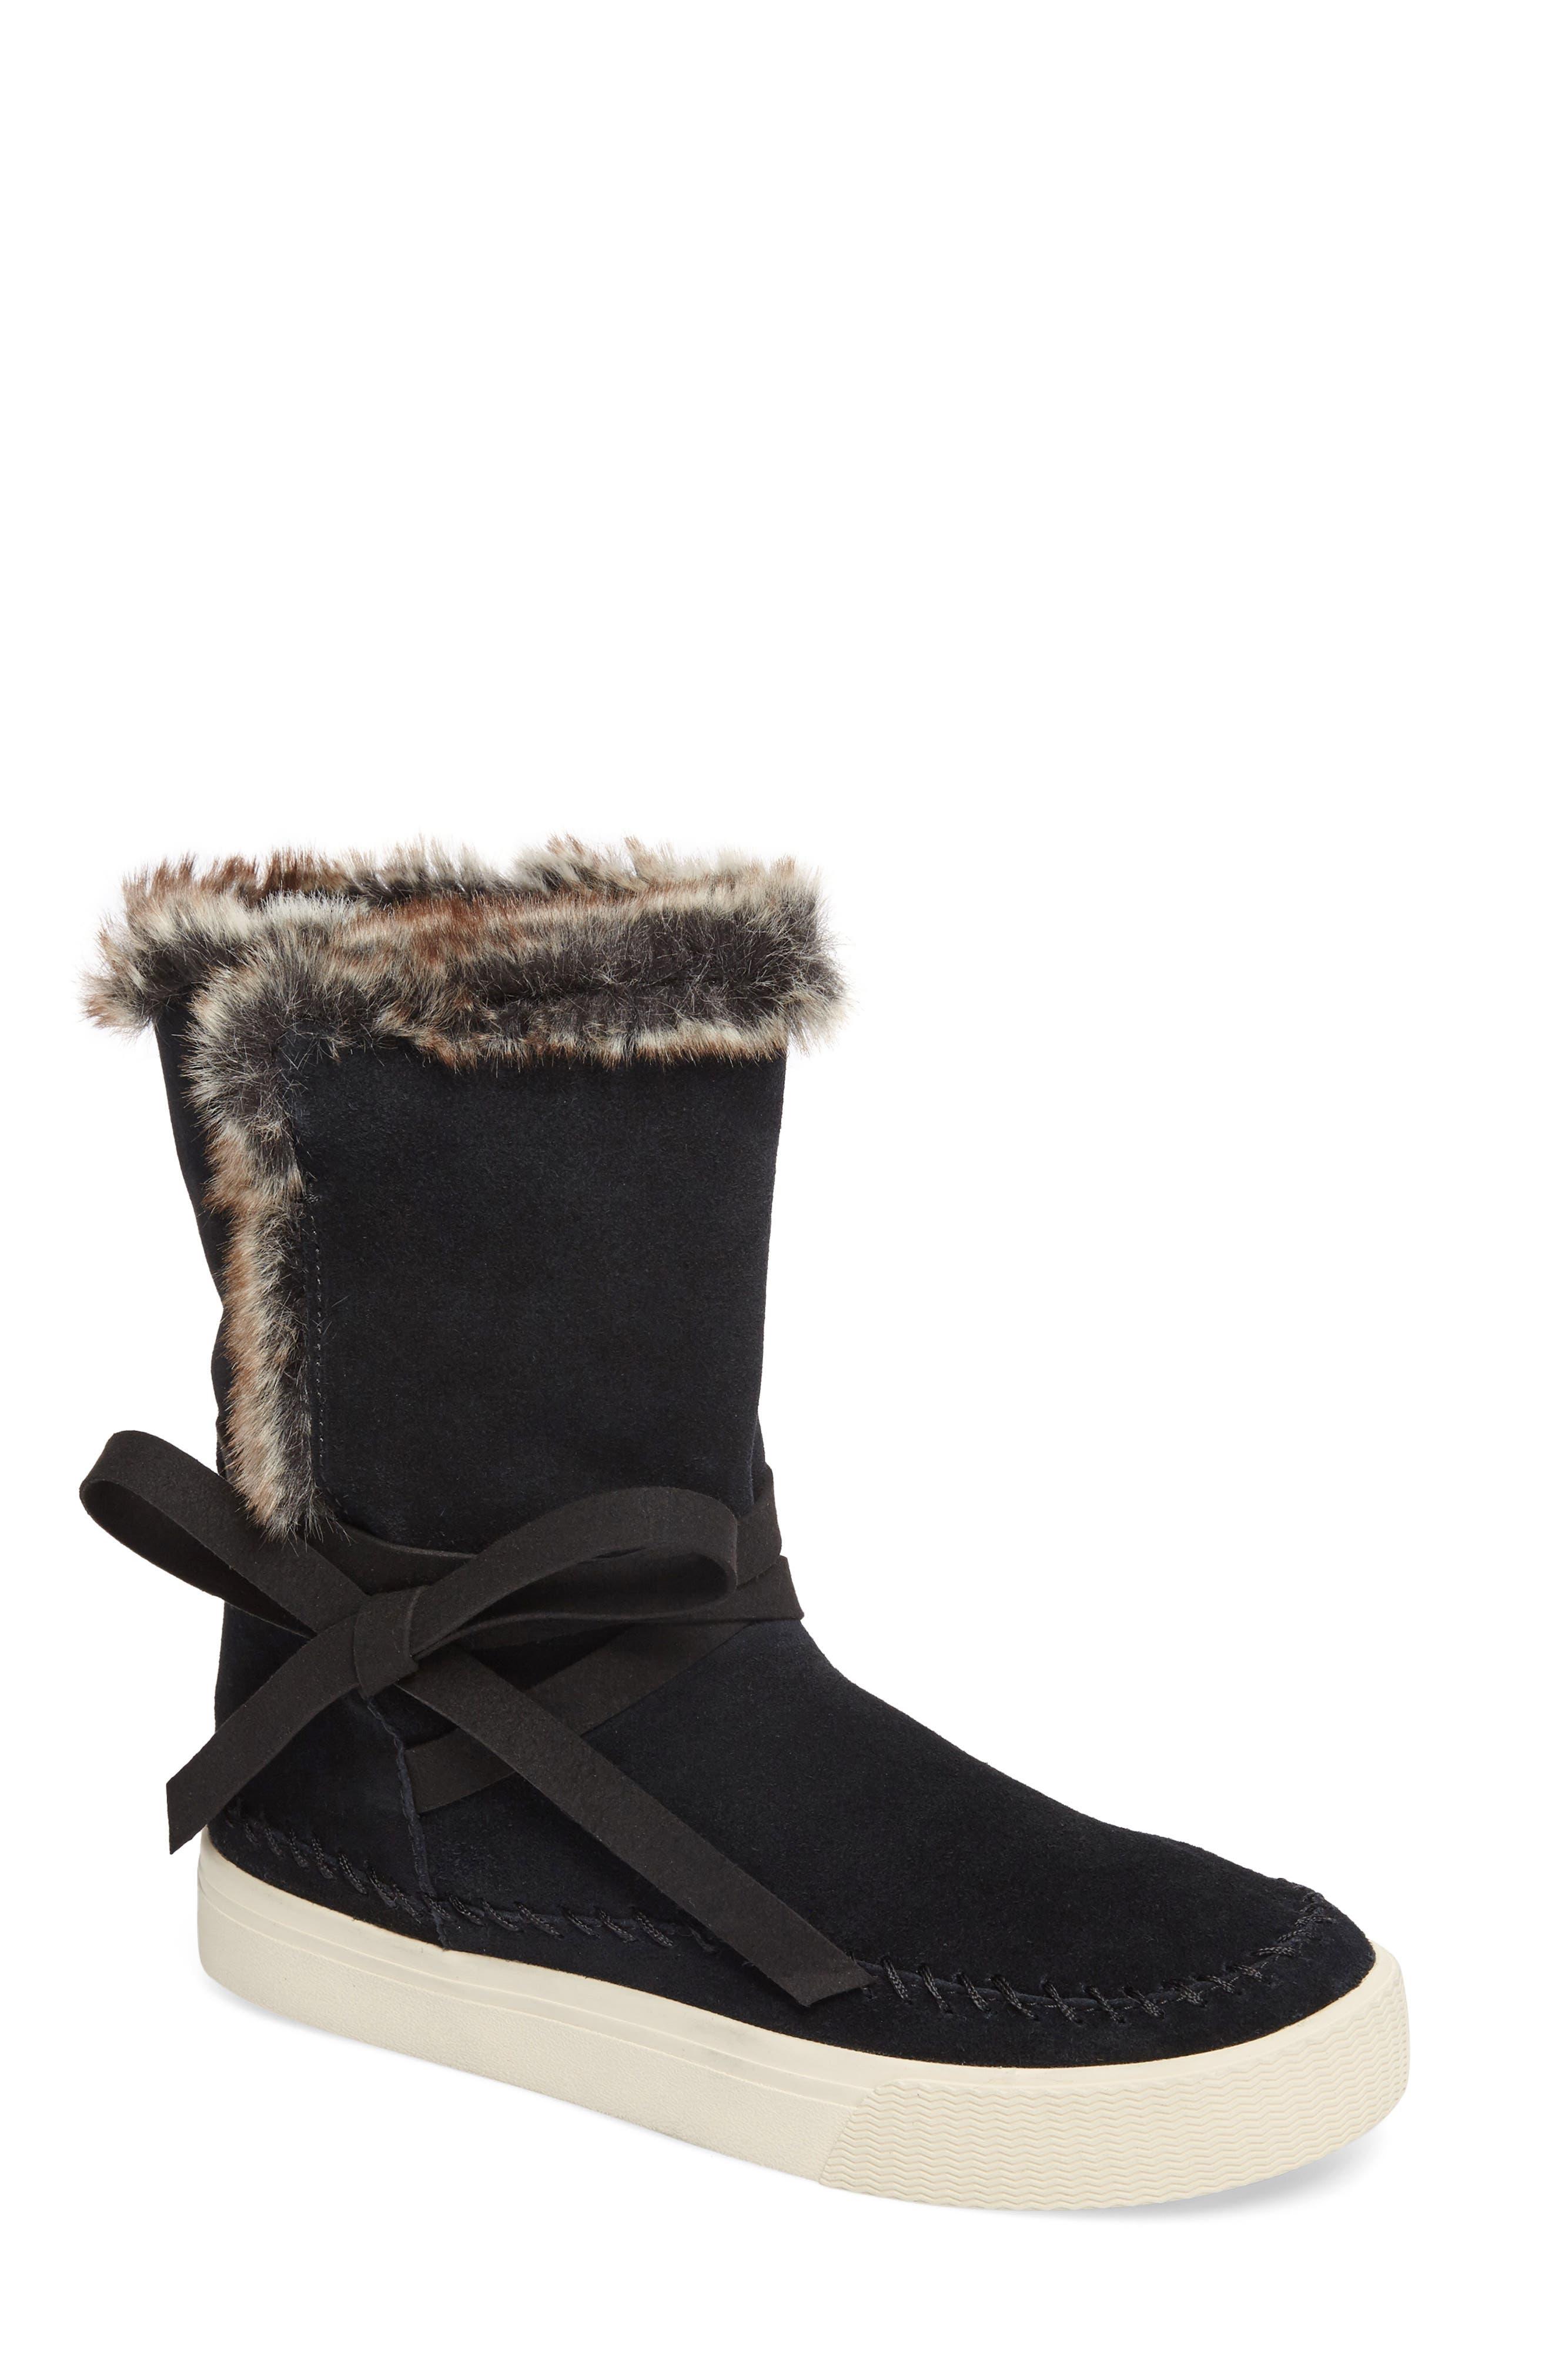 Alternate Image 1 Selected - TOMS Vista Boot (Women)